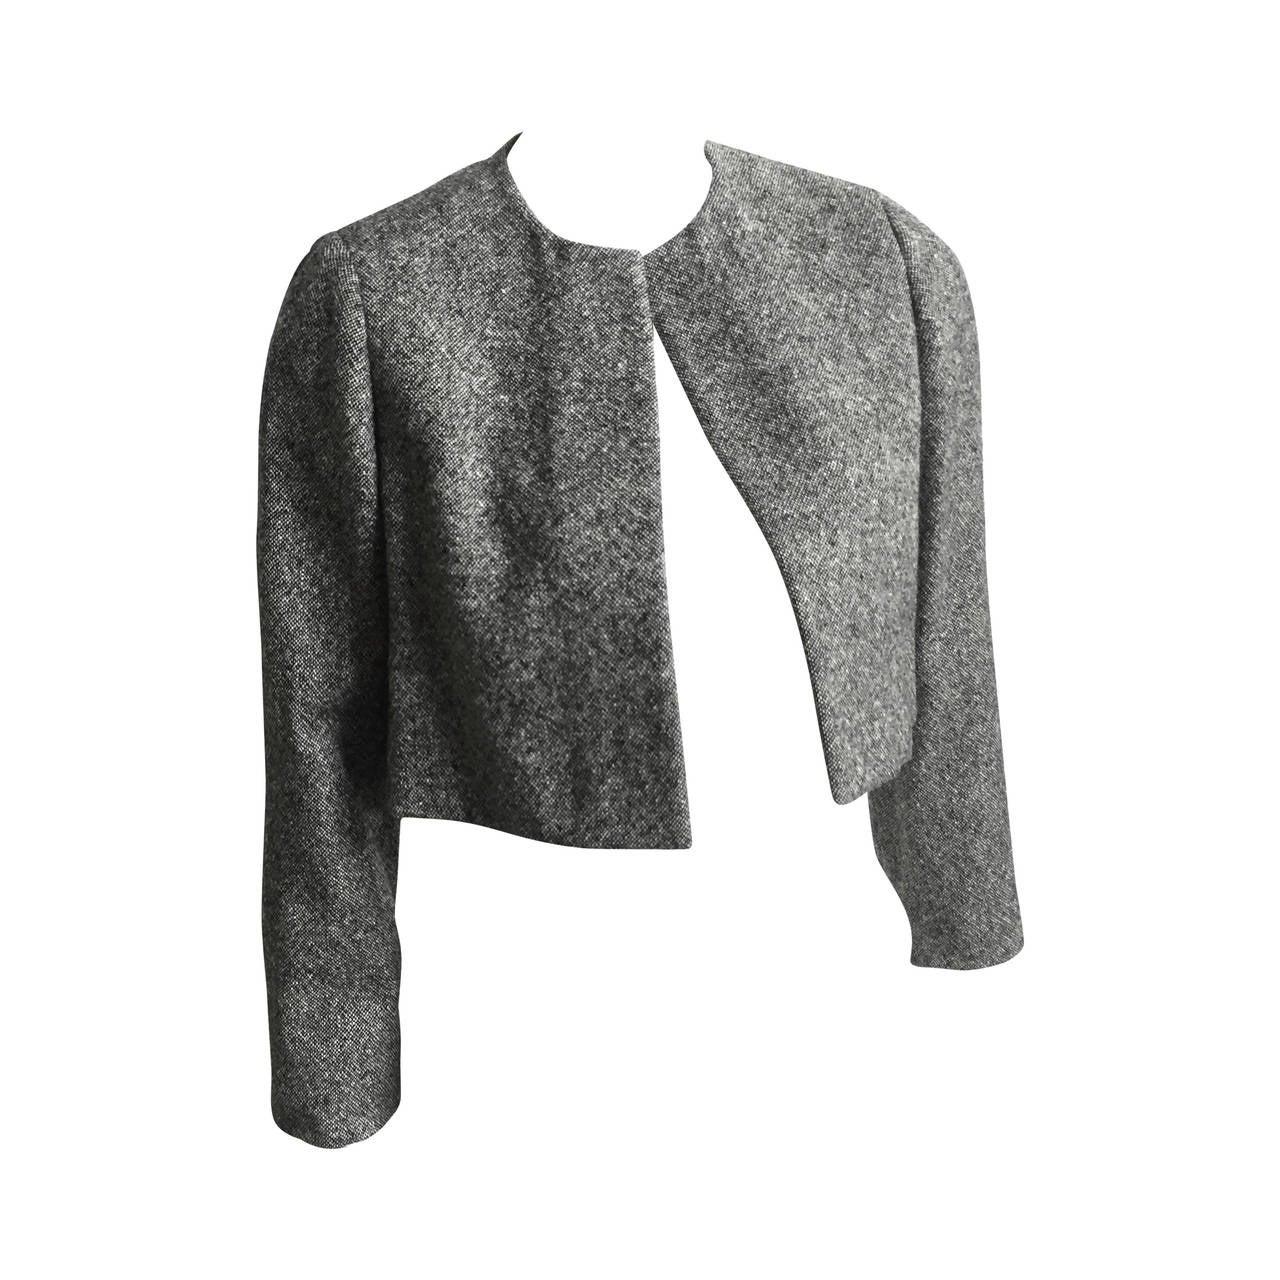 Pauline Trigere Cropped Jacket Size 6